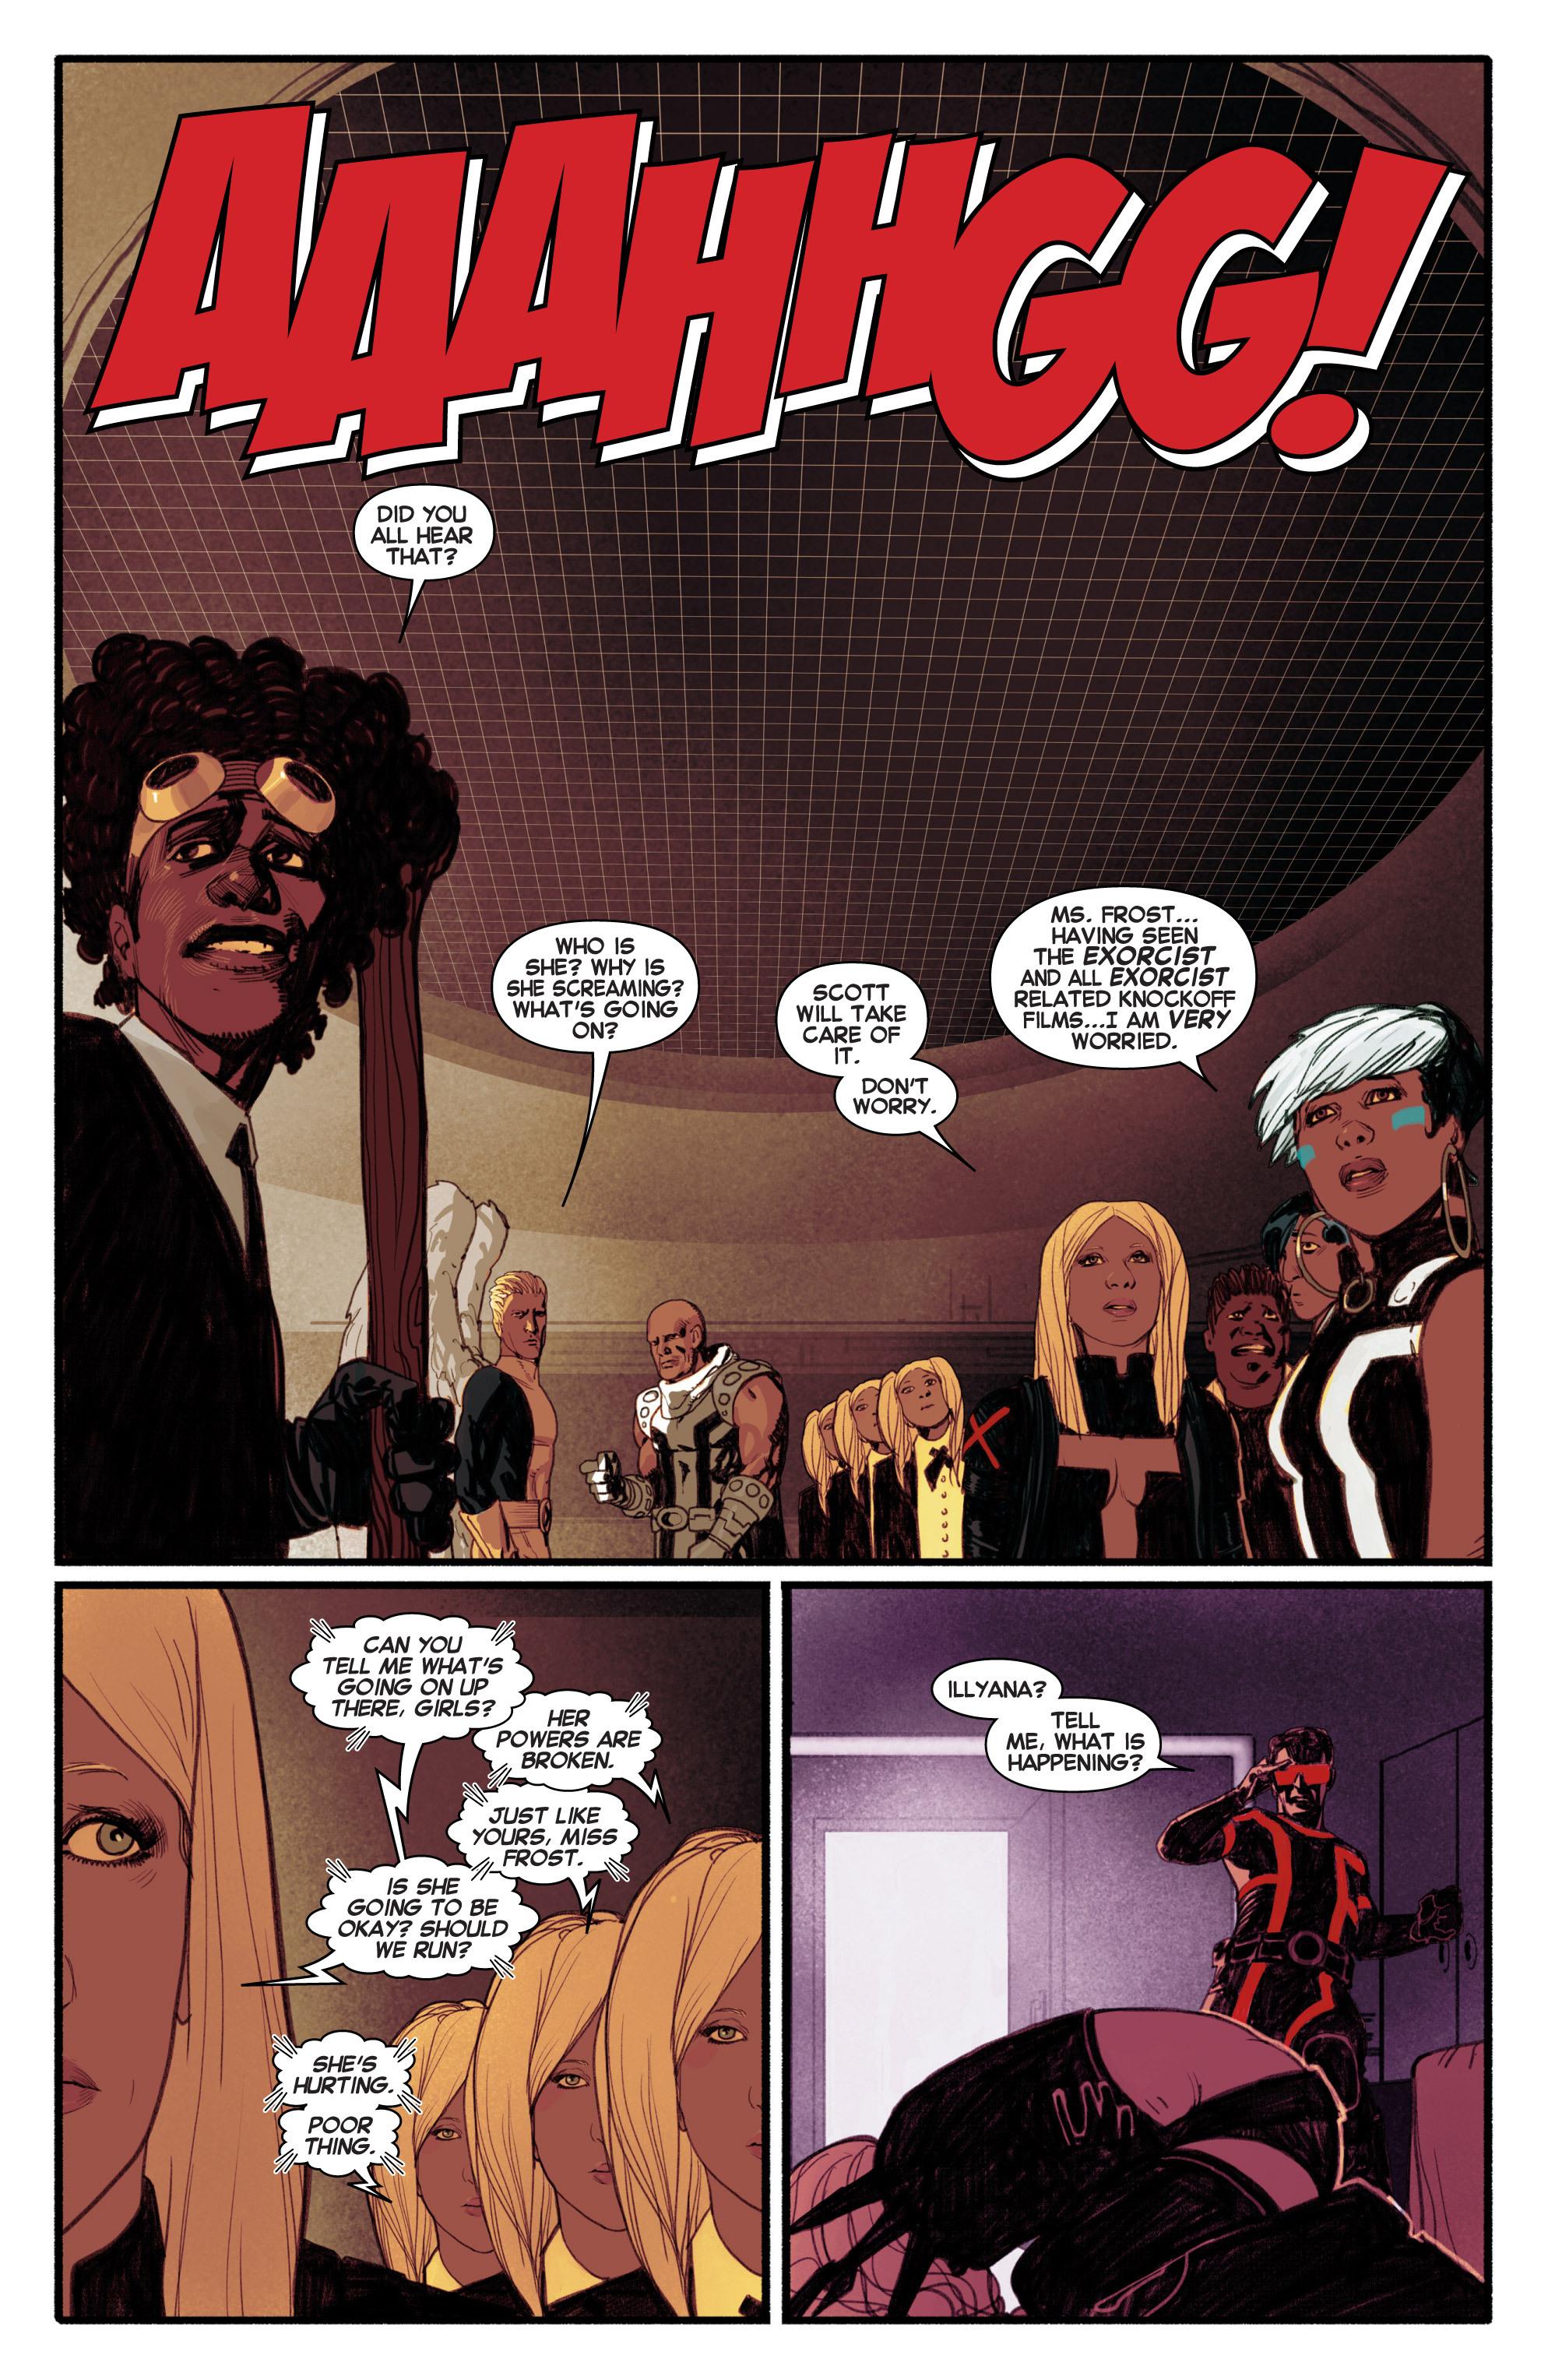 Read online Uncanny X-Men (2013) comic -  Issue # _TPB 1 - Revolution - 99